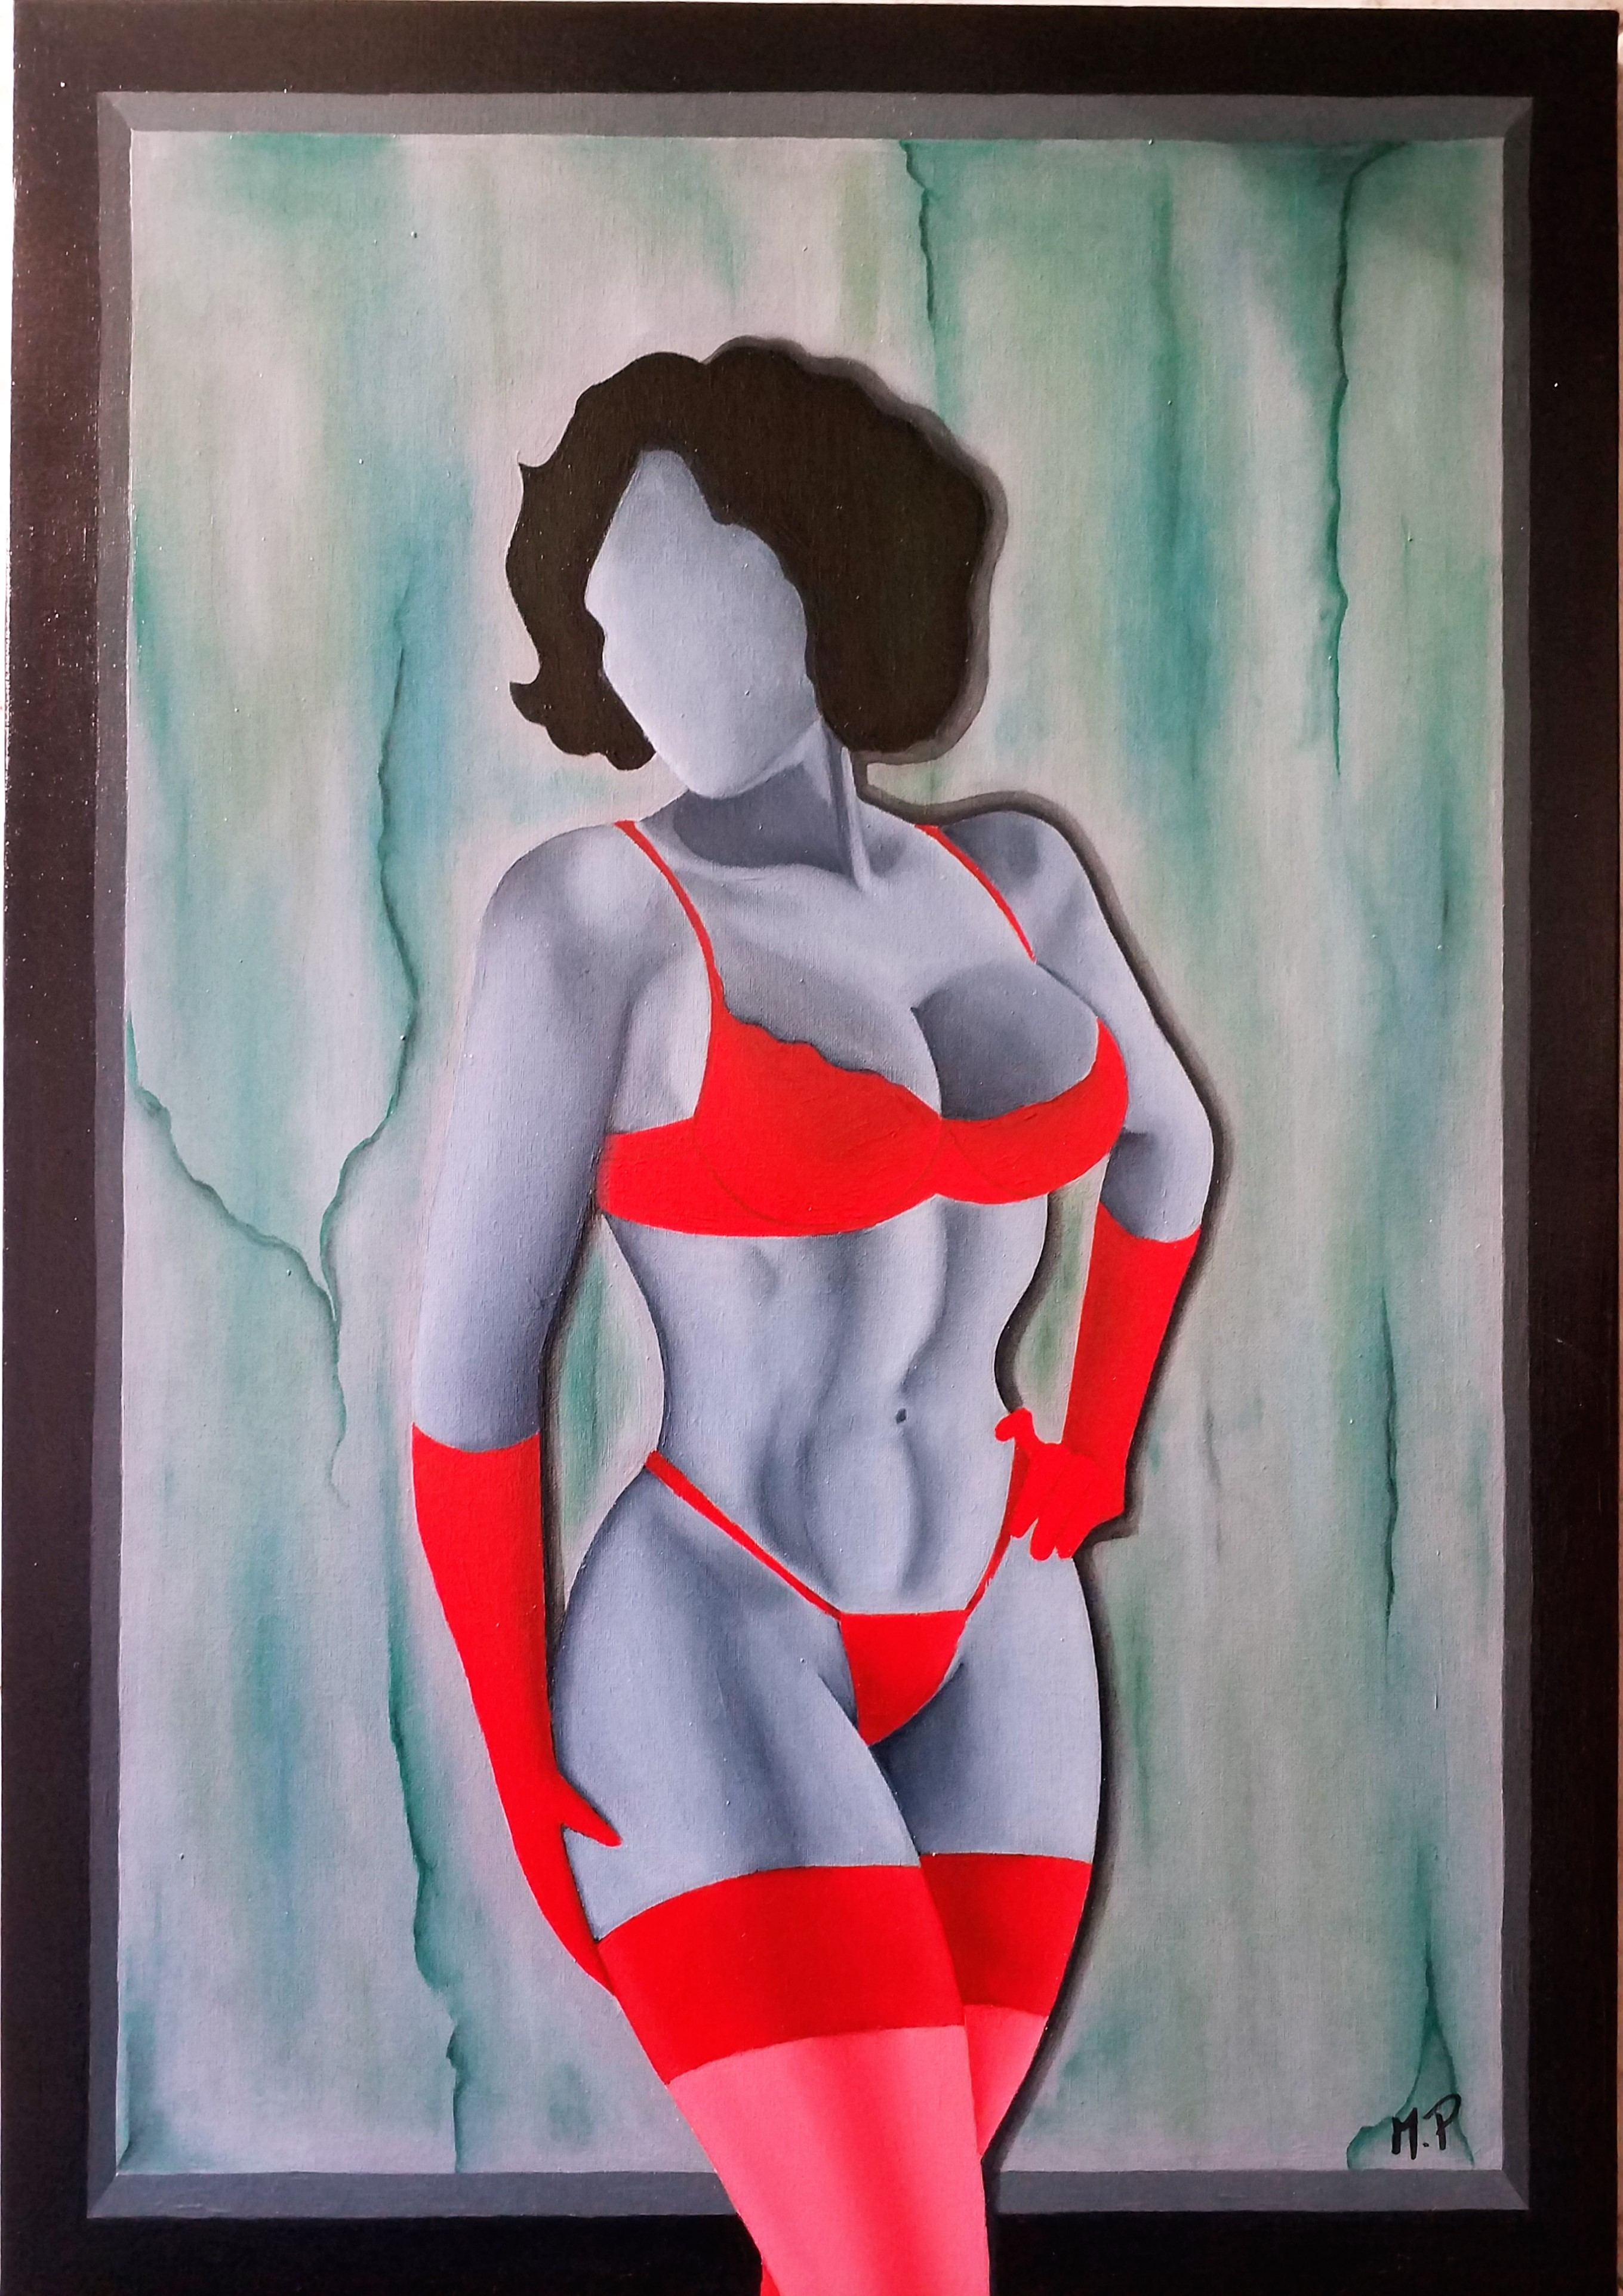 Erotismo (eroticism), 2018 olio su tela cm 35x50, Pasquale Mastrogiacomo, Acerno(SA)